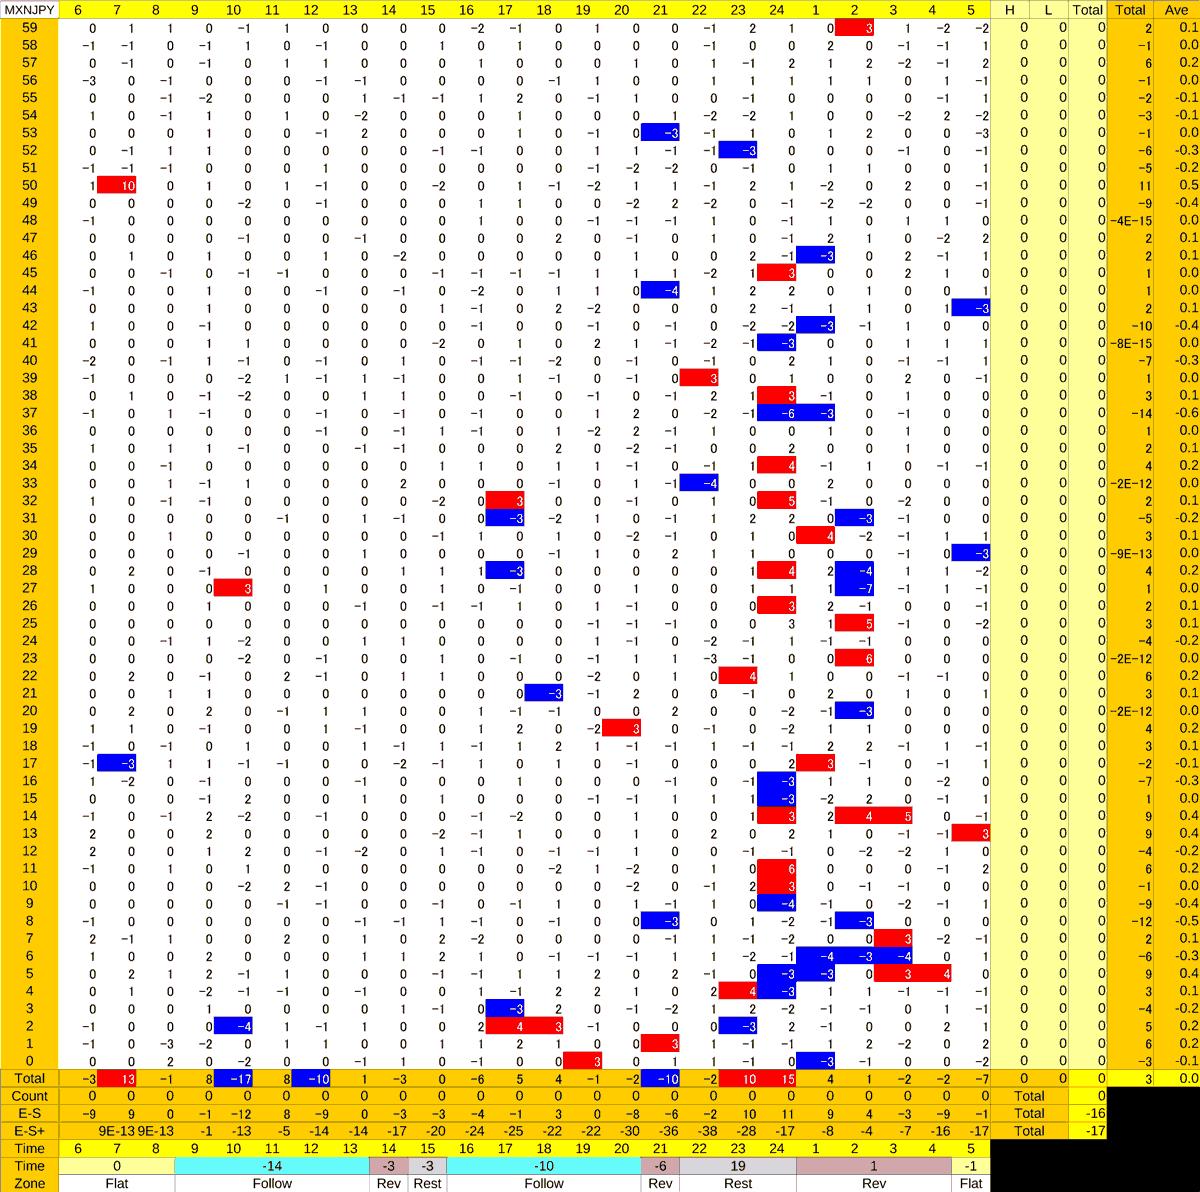 20210115_HS(3)MXNJPY